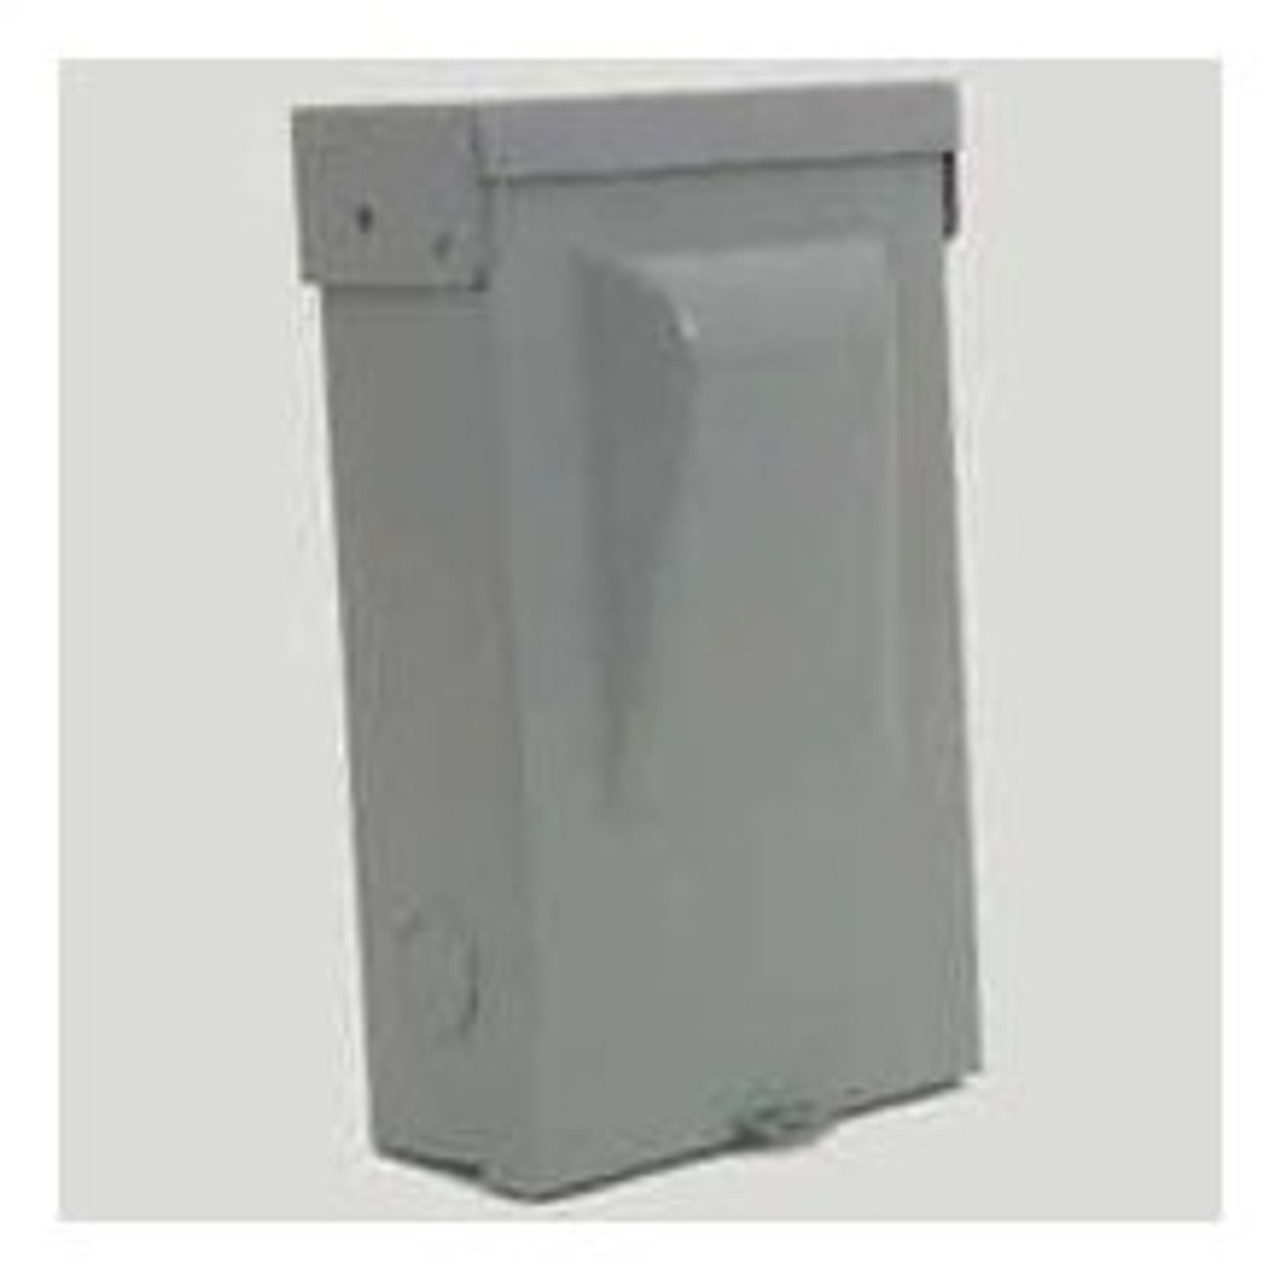 60 amp disconnect fuse box mars 80317 mar80317 indoor comfort rh indoorcomfortsupply com